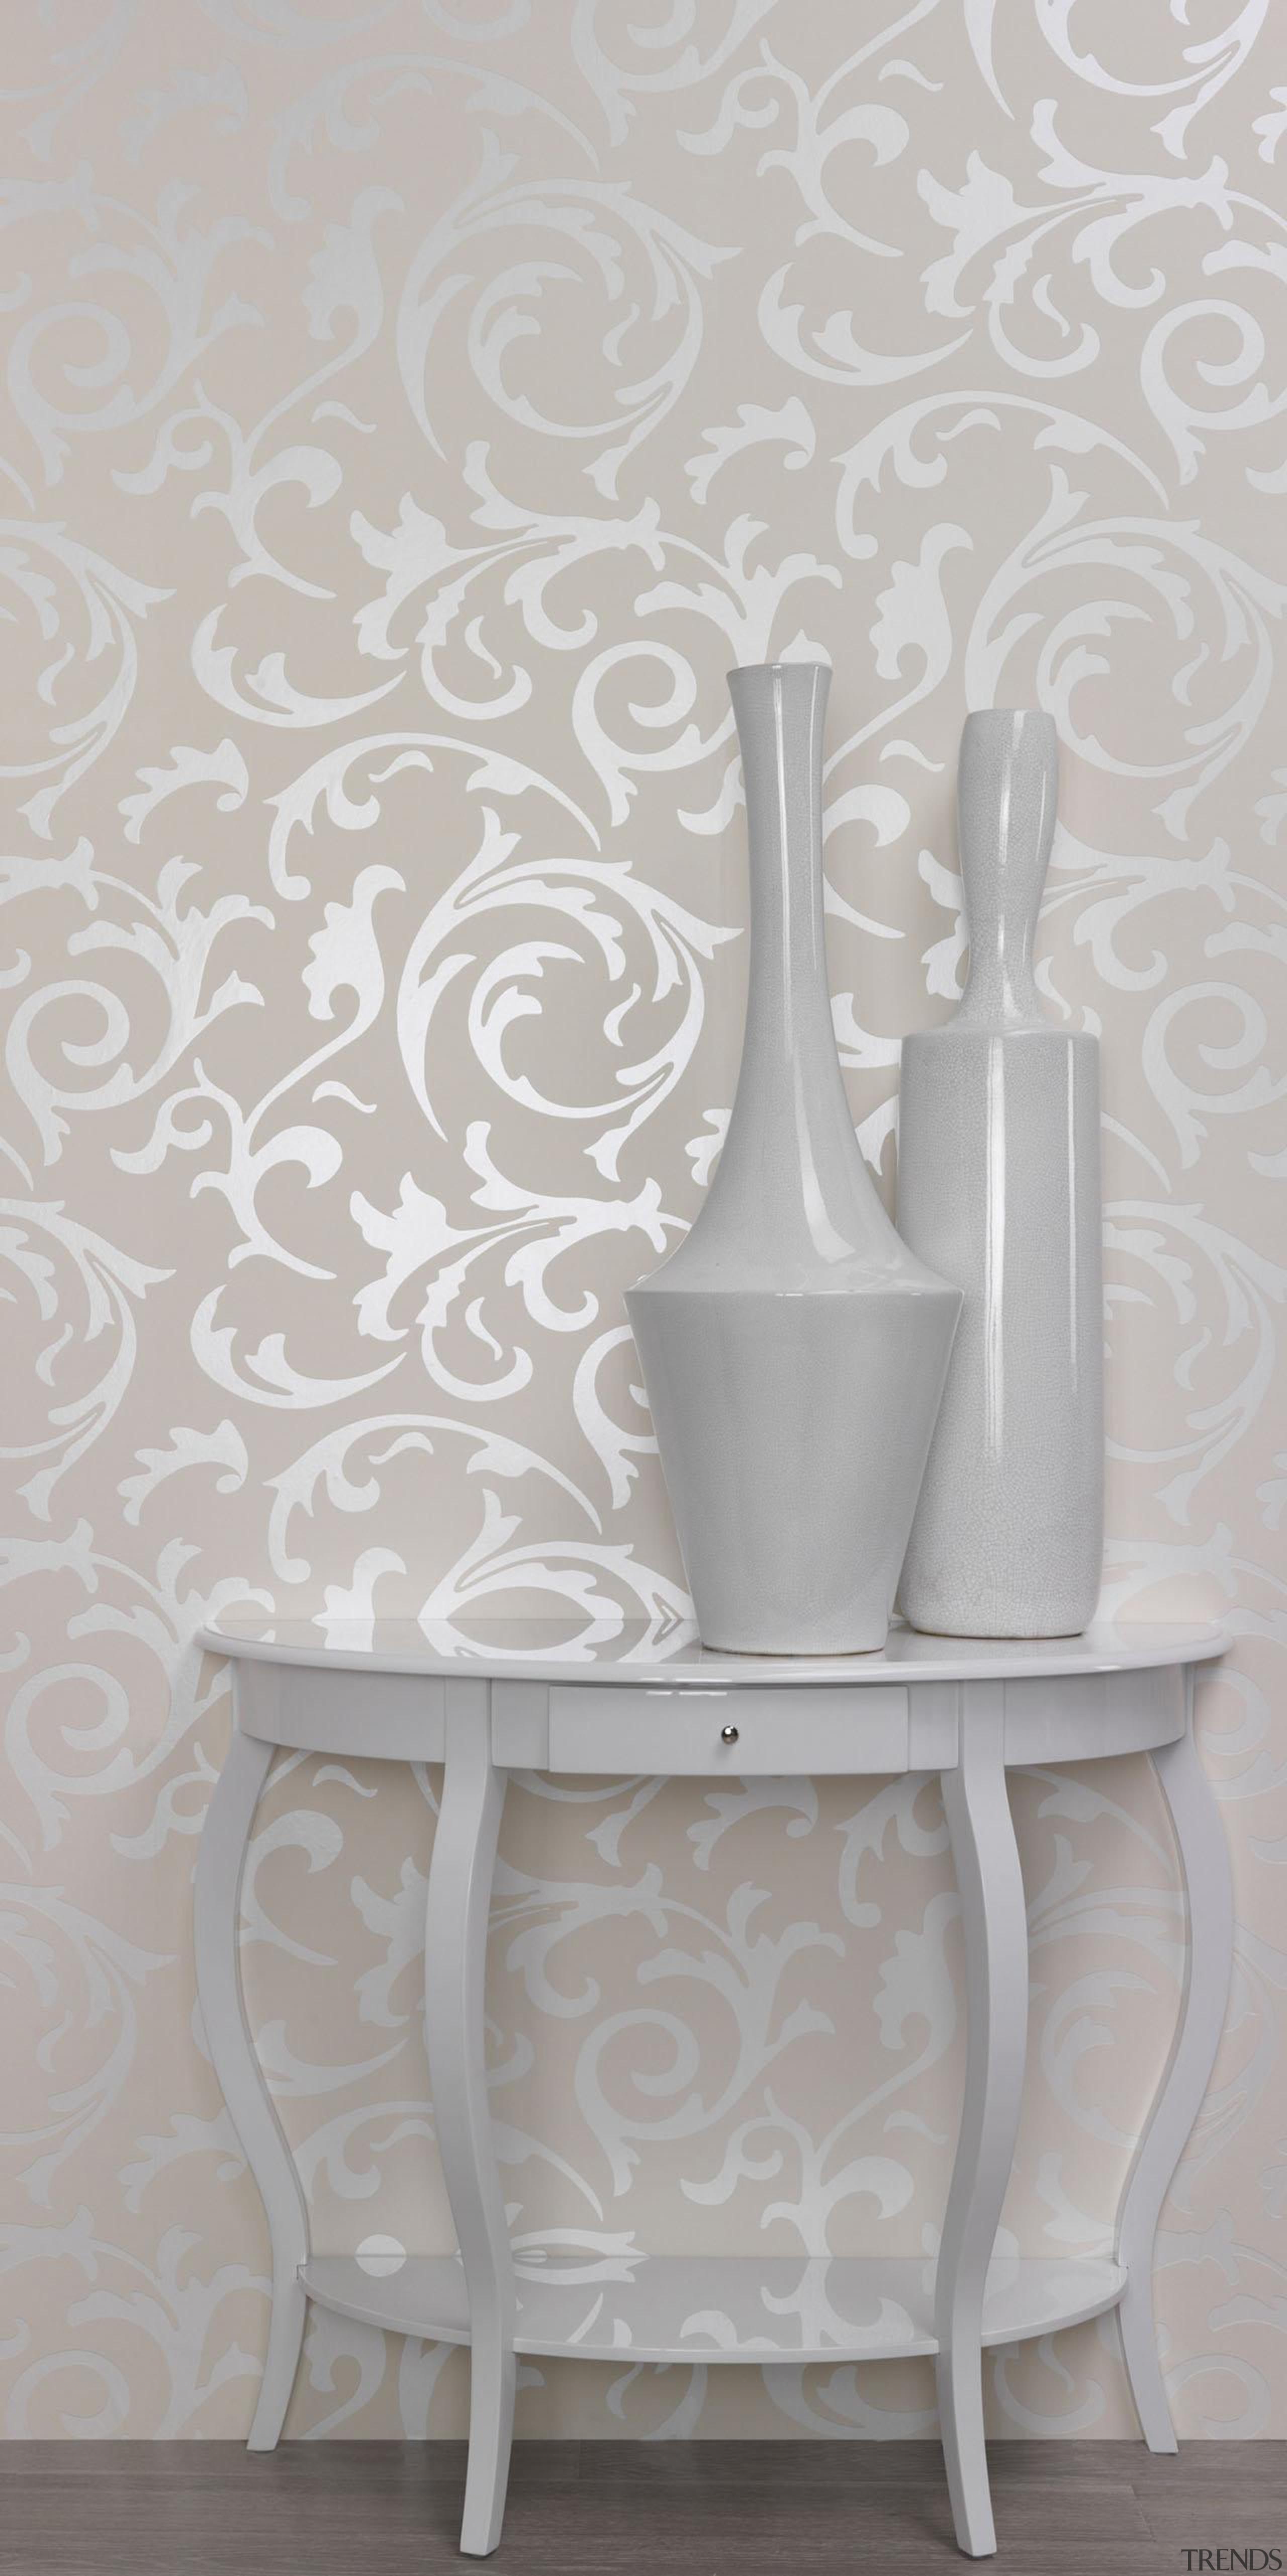 Brocante II Range - Brocante II Range - ceramic, chair, floor, furniture, interior design, product, product design, table, wall, wallpaper, gray